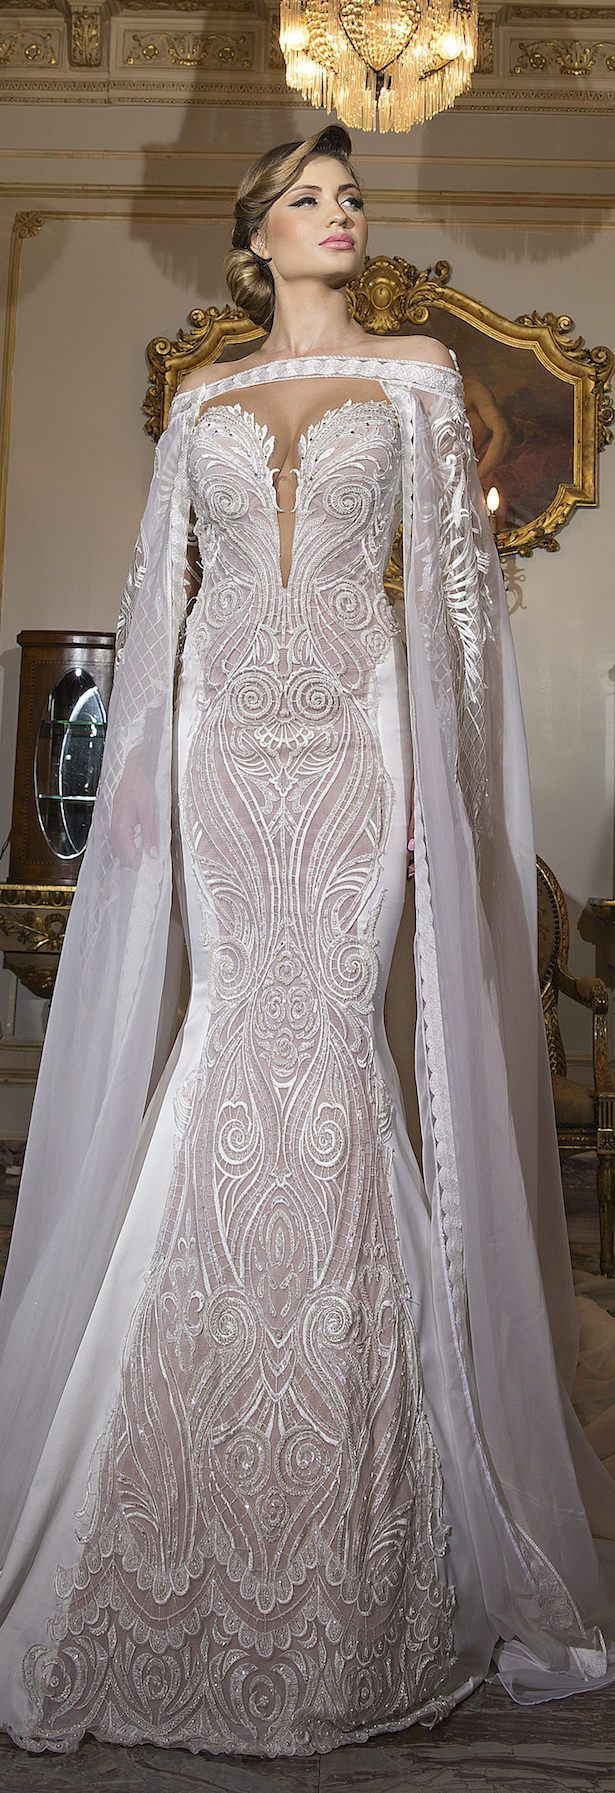 2656 Best Wedding Dress Designer Images On Pinterest Short Gowns Frocks And